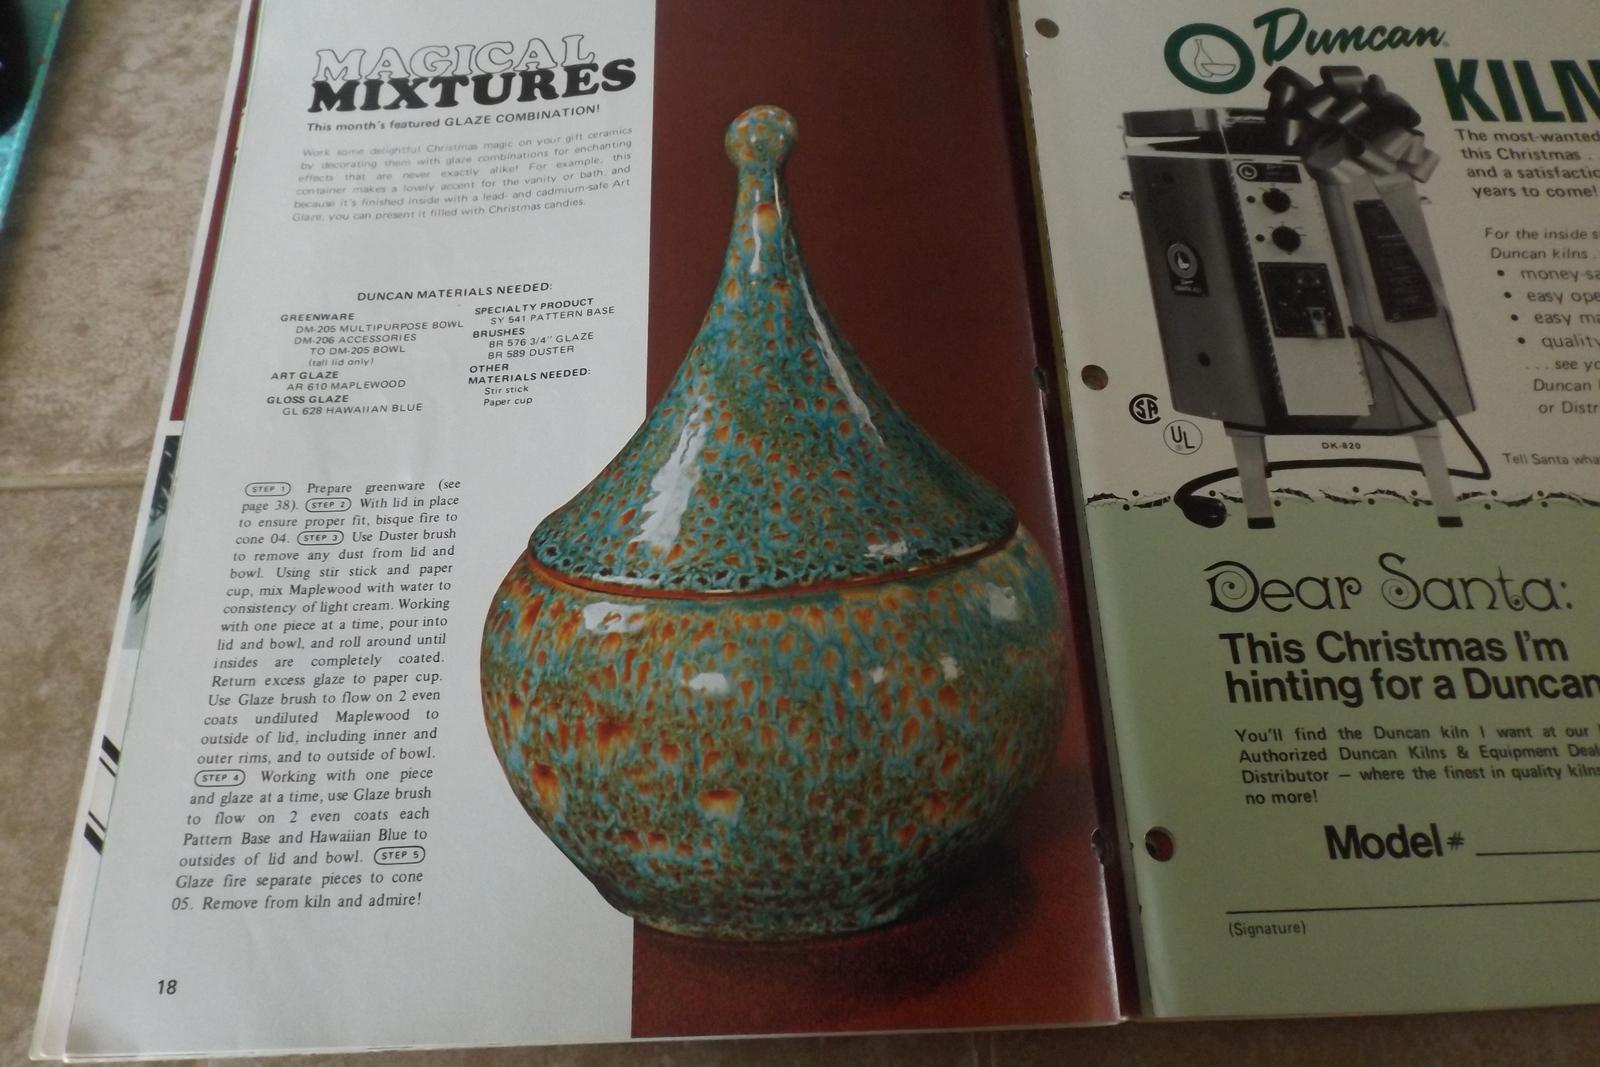 Ceramics - October 1977